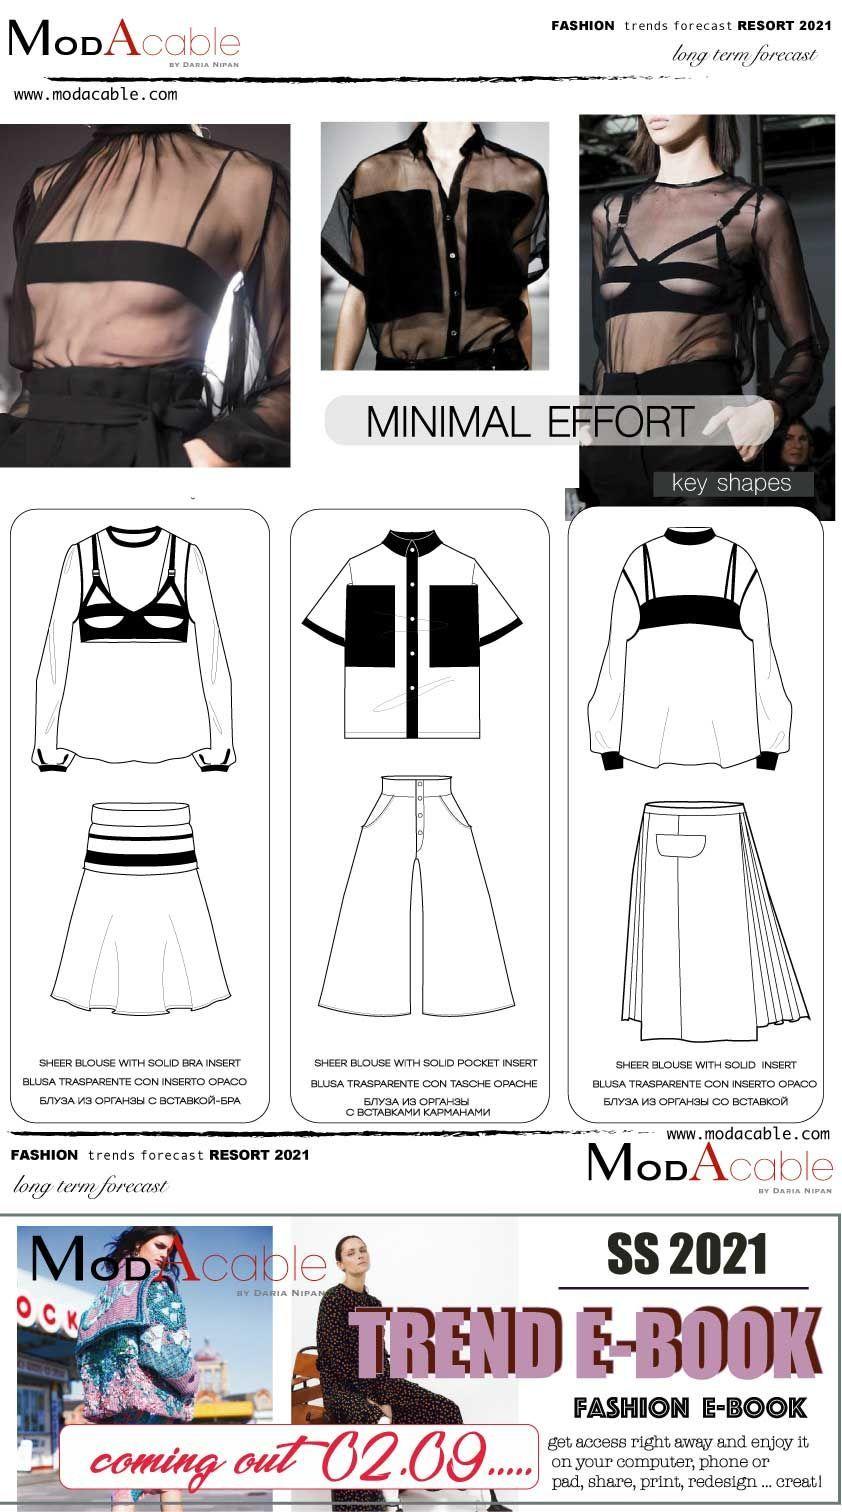 Resort 8 fashion trends Fashion Trends Retort 8  Fashion